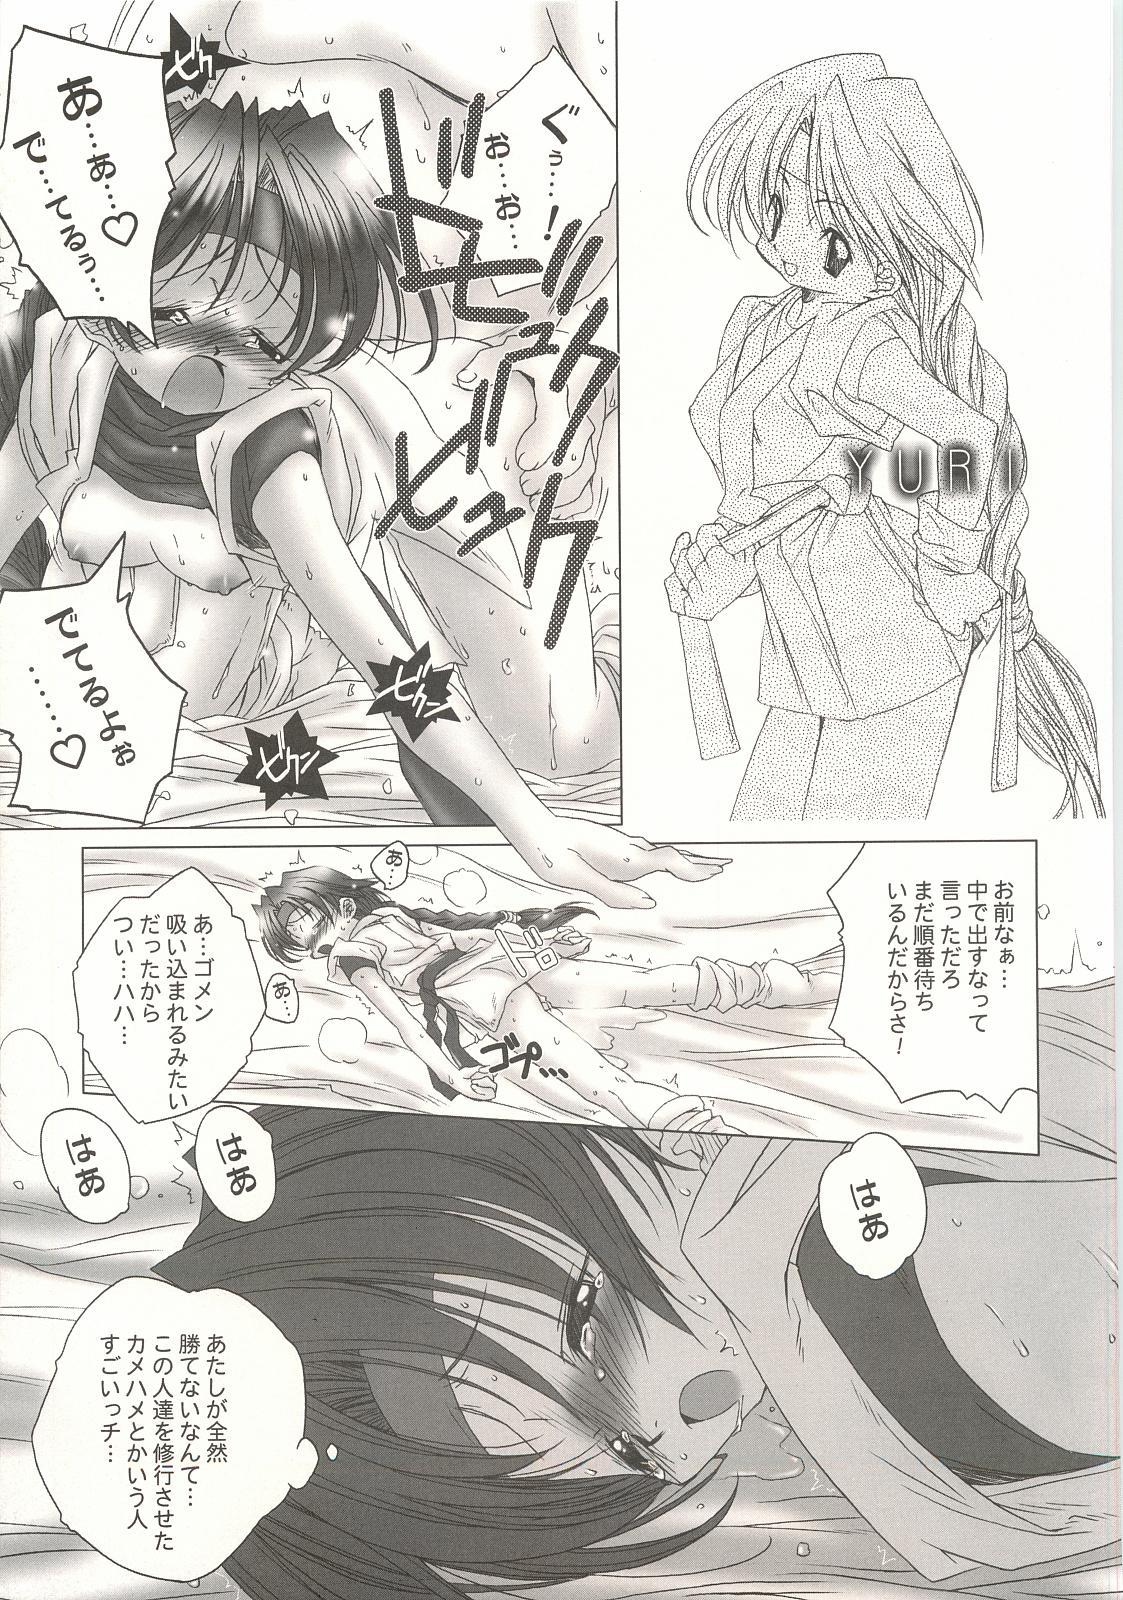 Sakurara Kanzenban 9